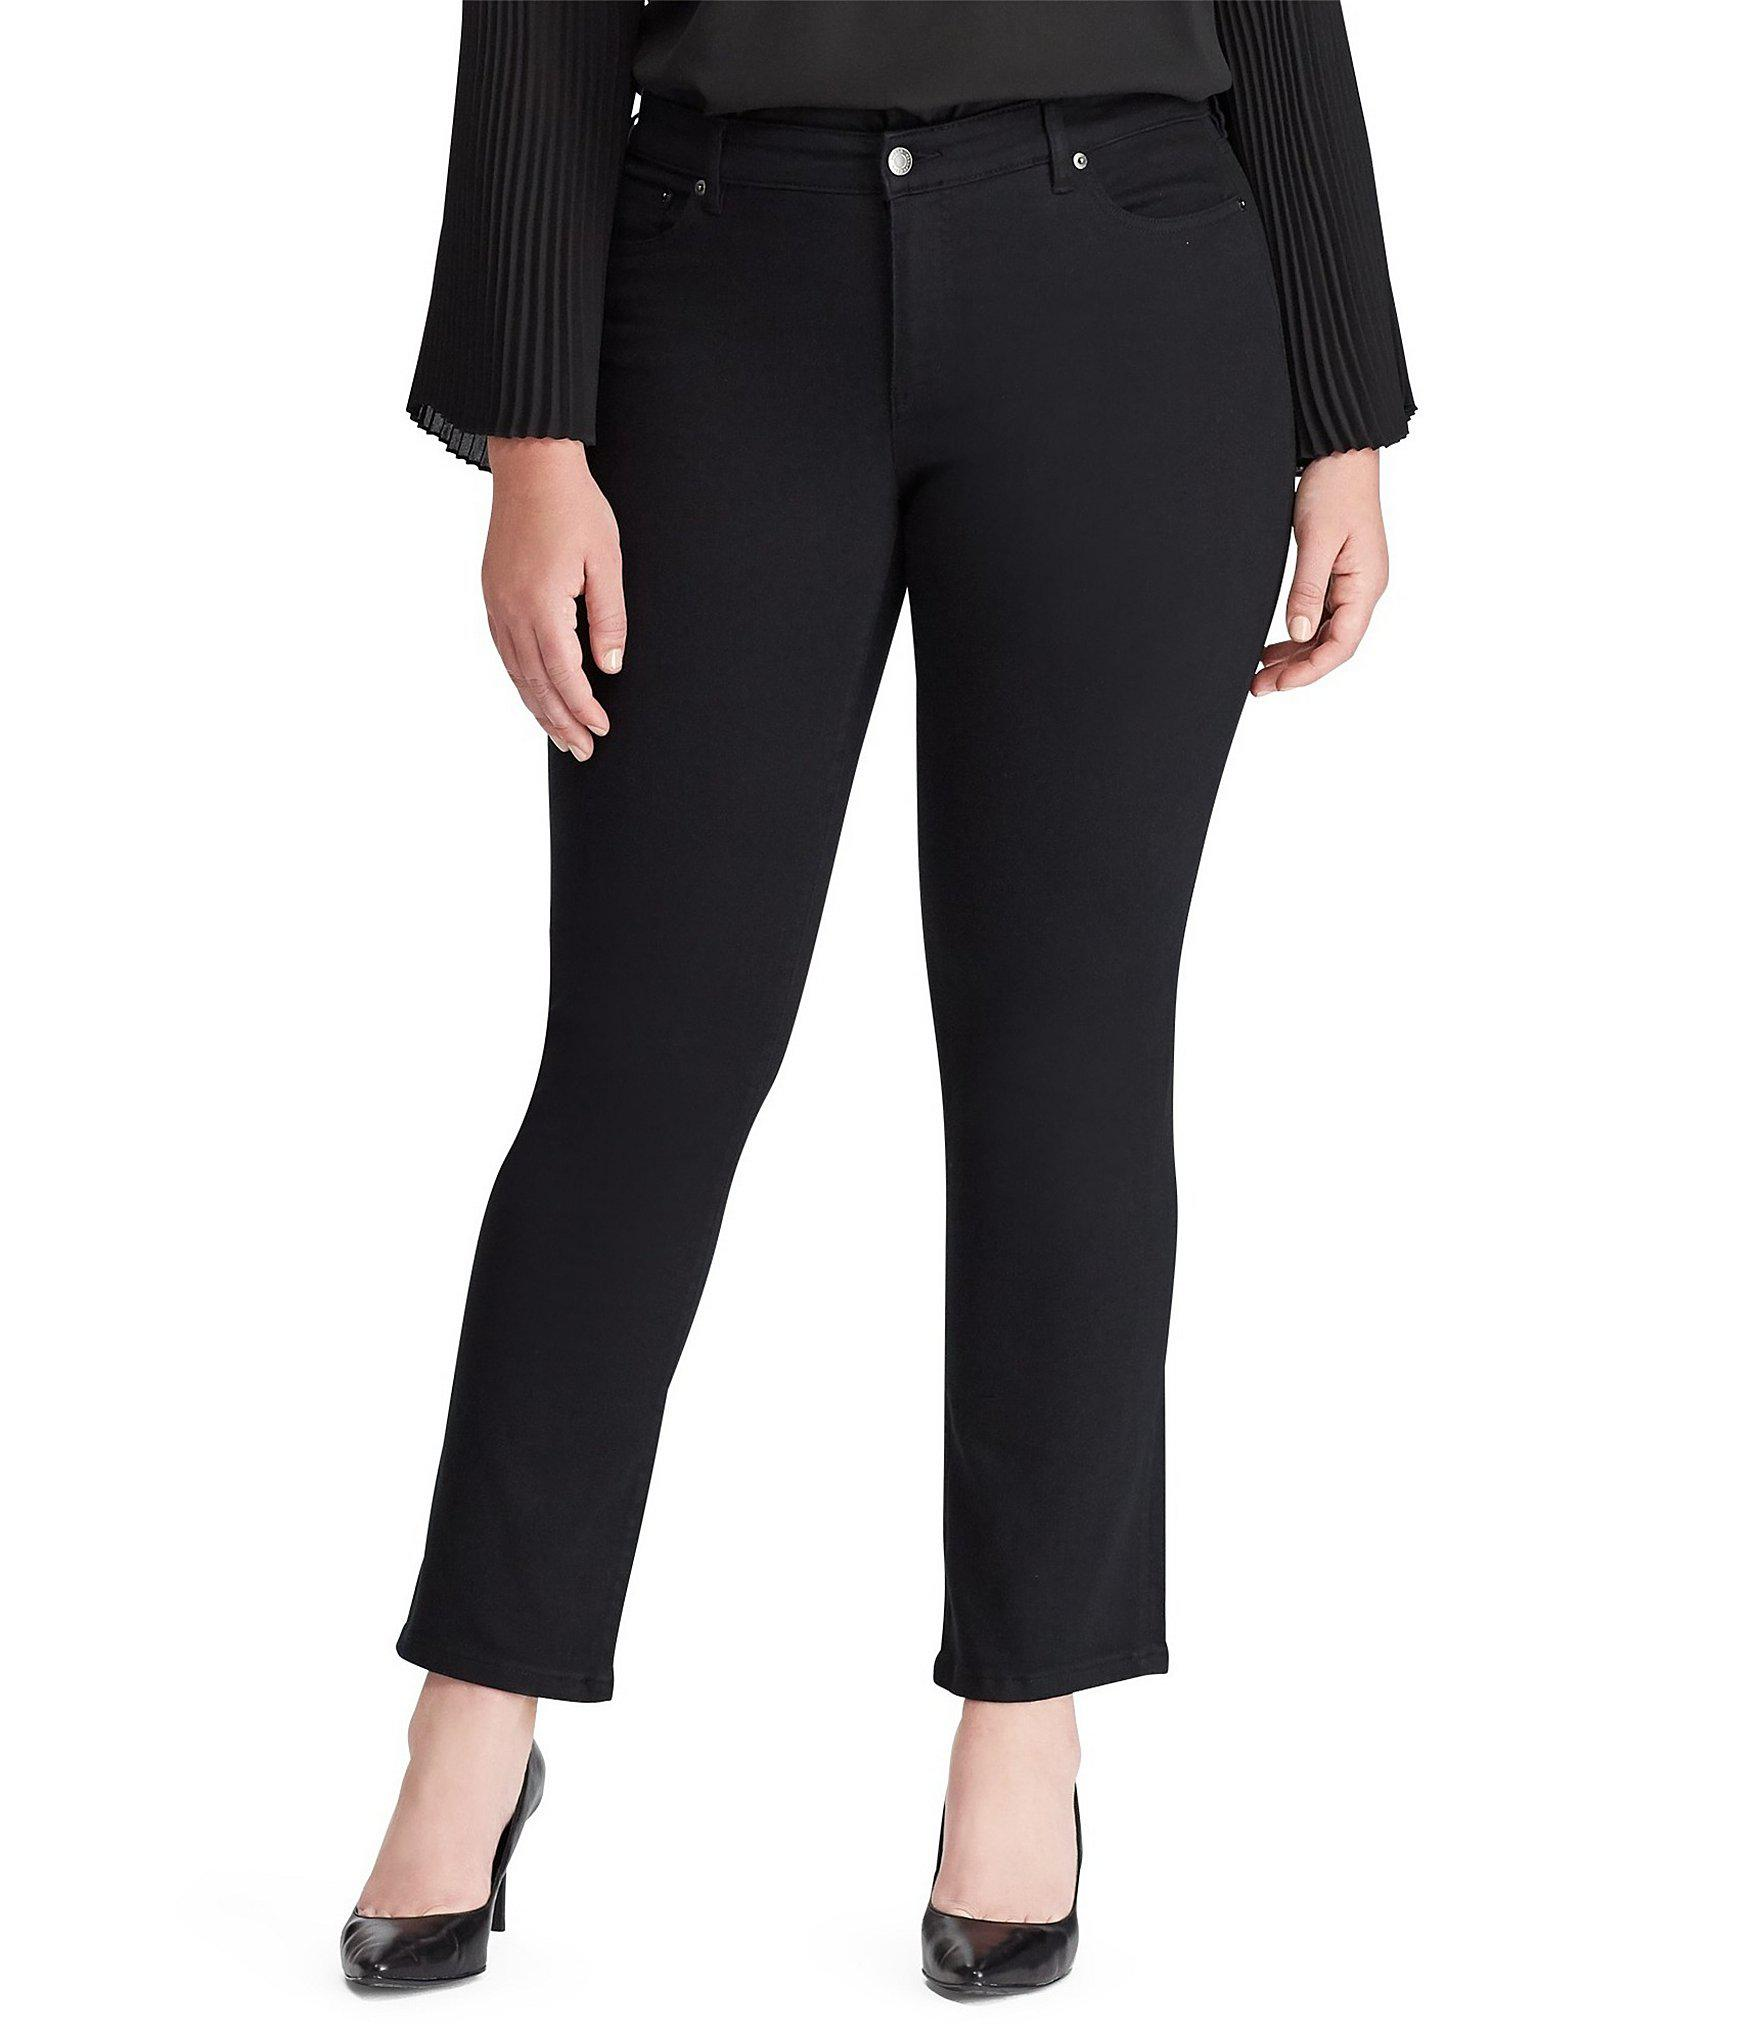 46b5ab3c272c5 Lauren by Ralph Lauren. Women s Black Plus Size Modern Straight Curvy Jeans